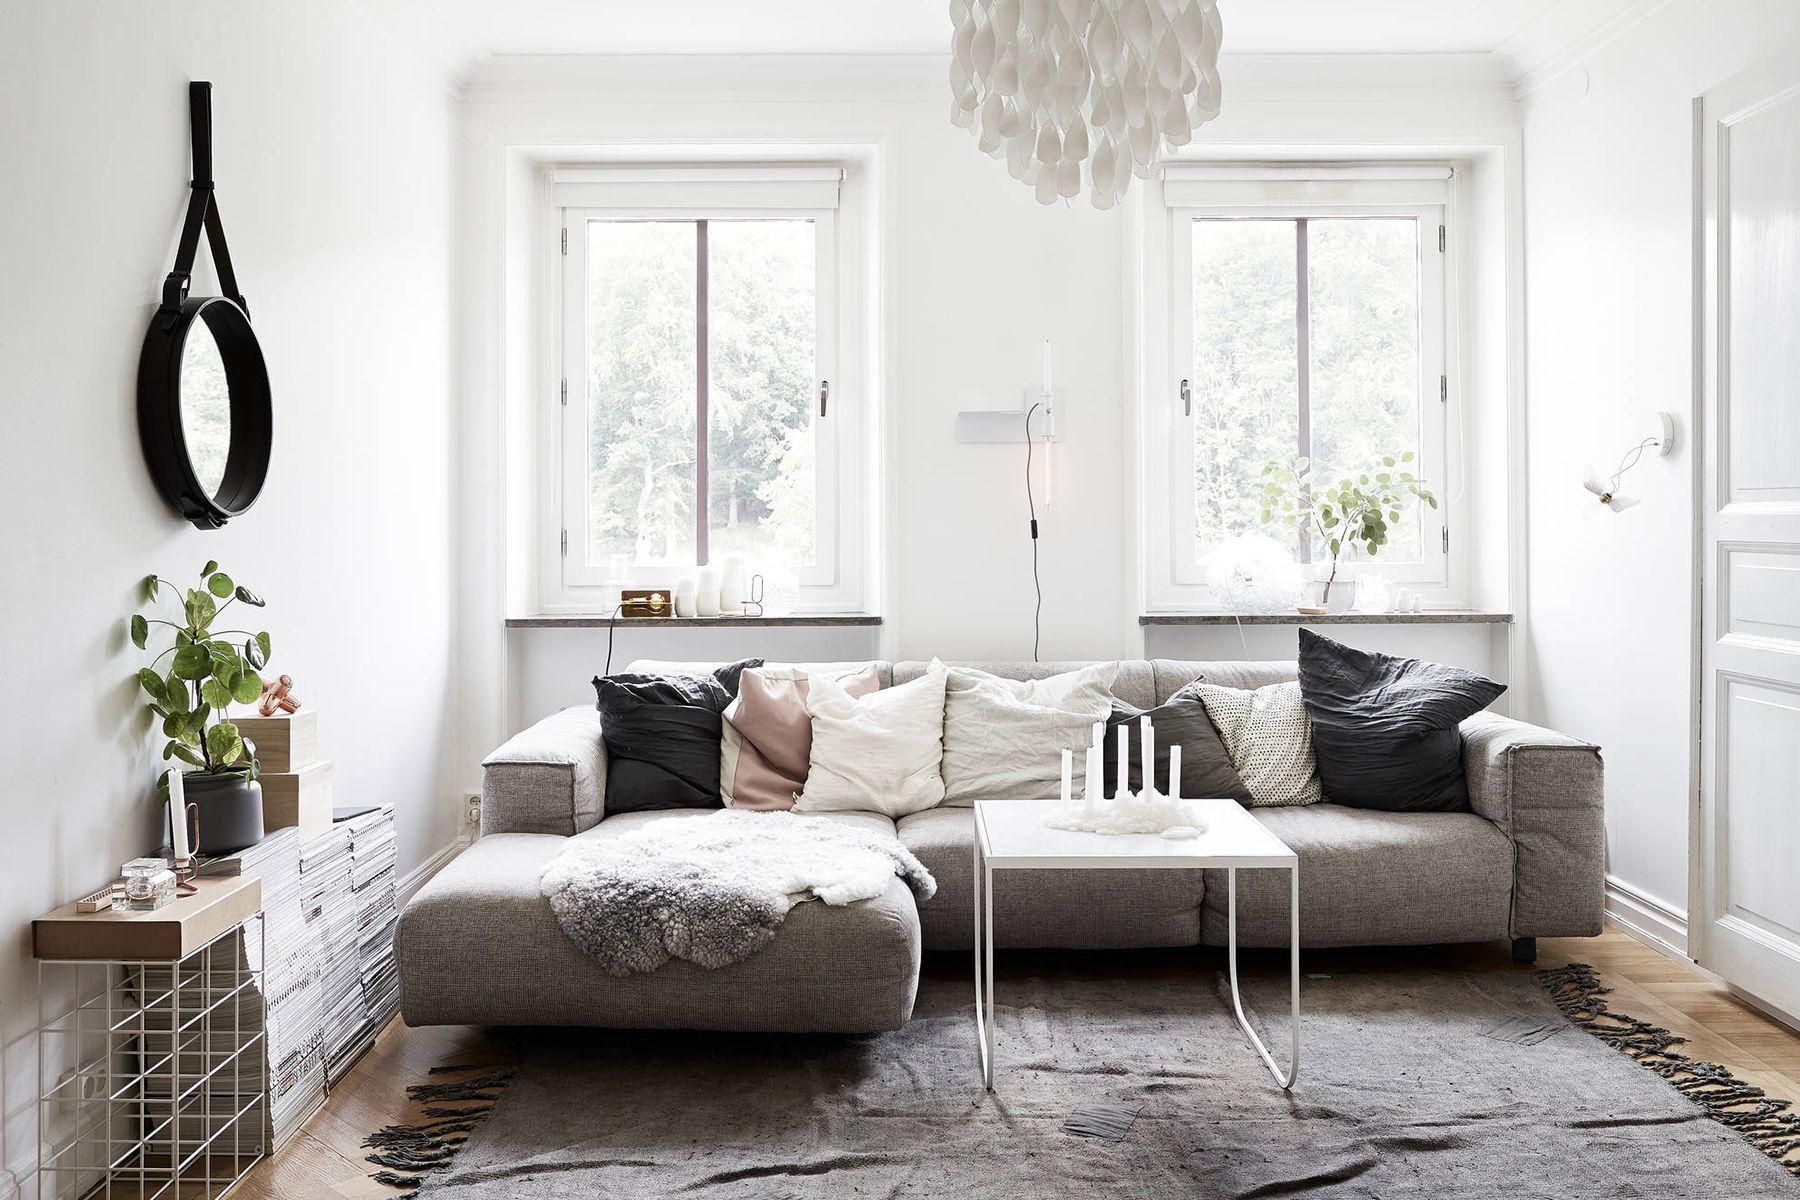 Scandinavian living room textiles - Top 10 tips for adding ...